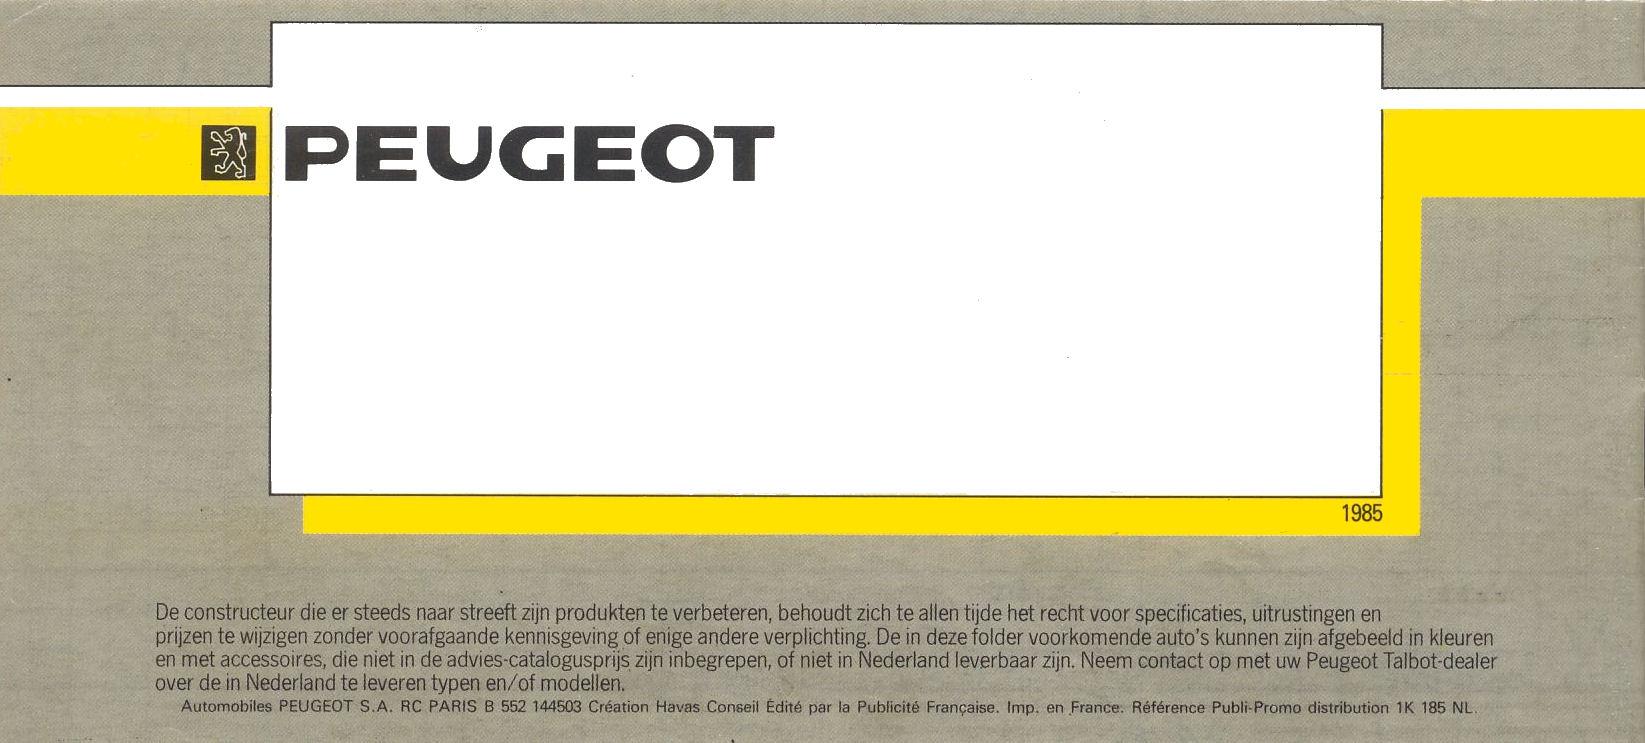 1985 peugeot range brochure